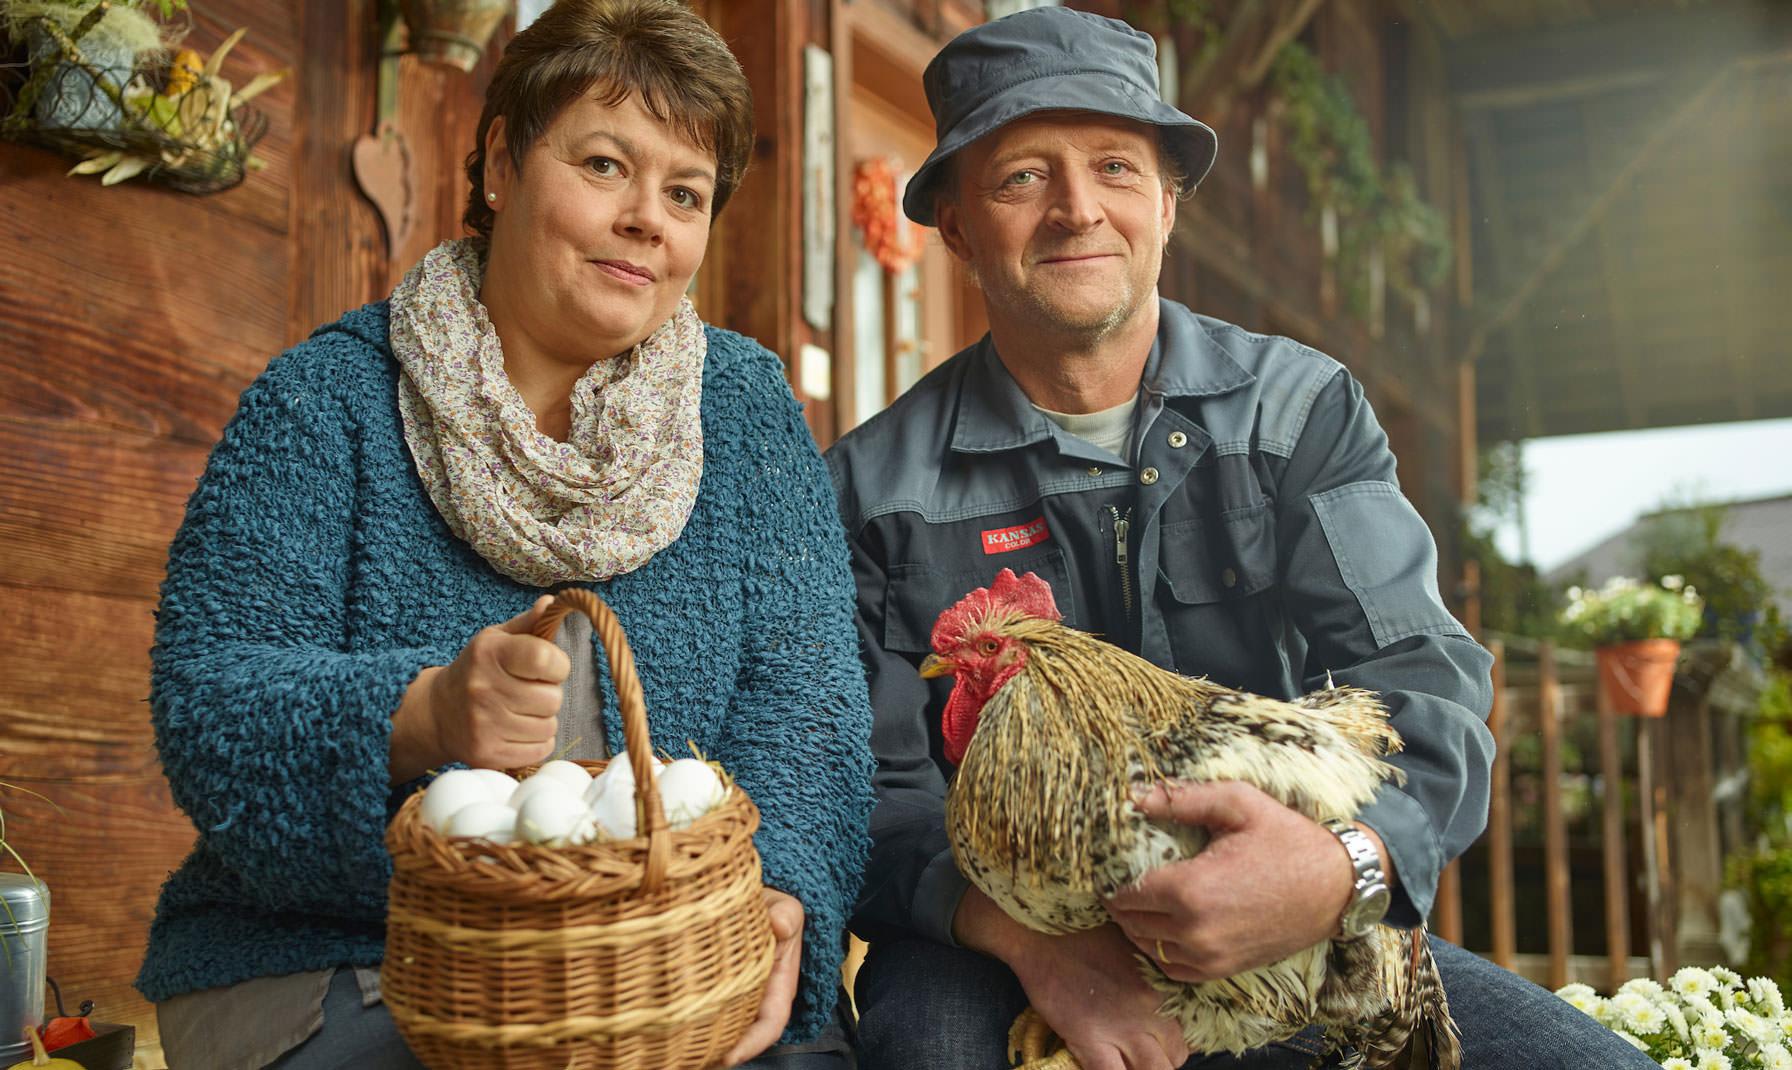 kambly-Huehner-Ein-Beitrag-zur-Lebensqualitaet_mobile